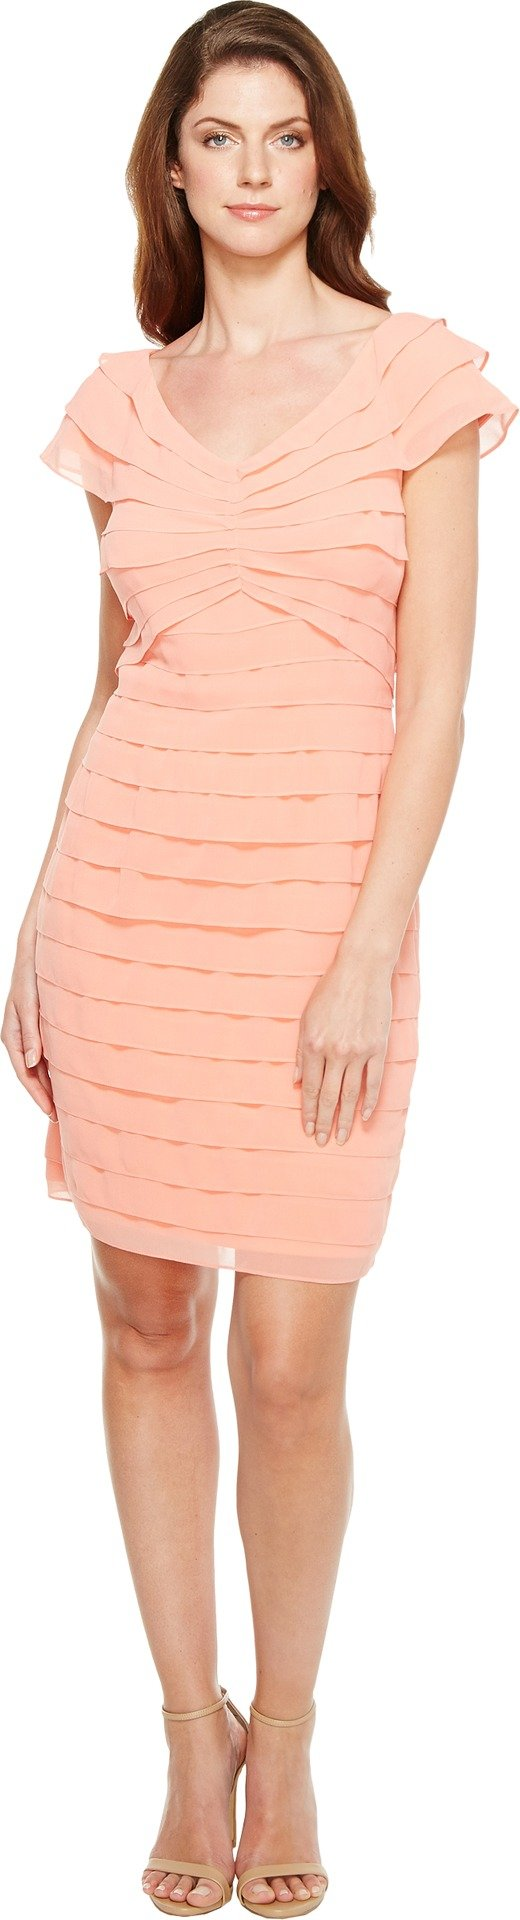 Available at Amazon: Adrianna Papell Women's Shutter Pleat Dress